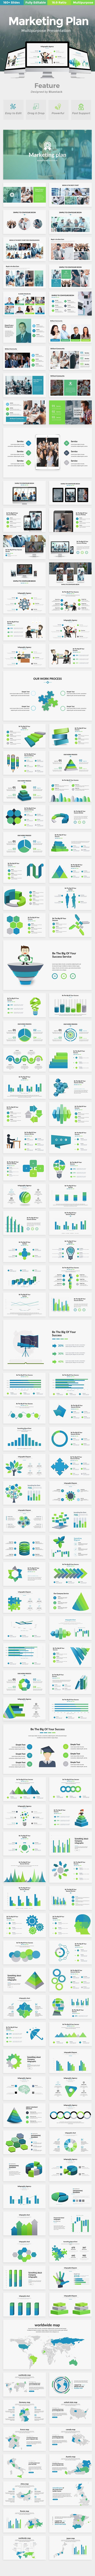 Marketing Plan Multipurpose Google Slide Template - Google Slides Presentation Templates